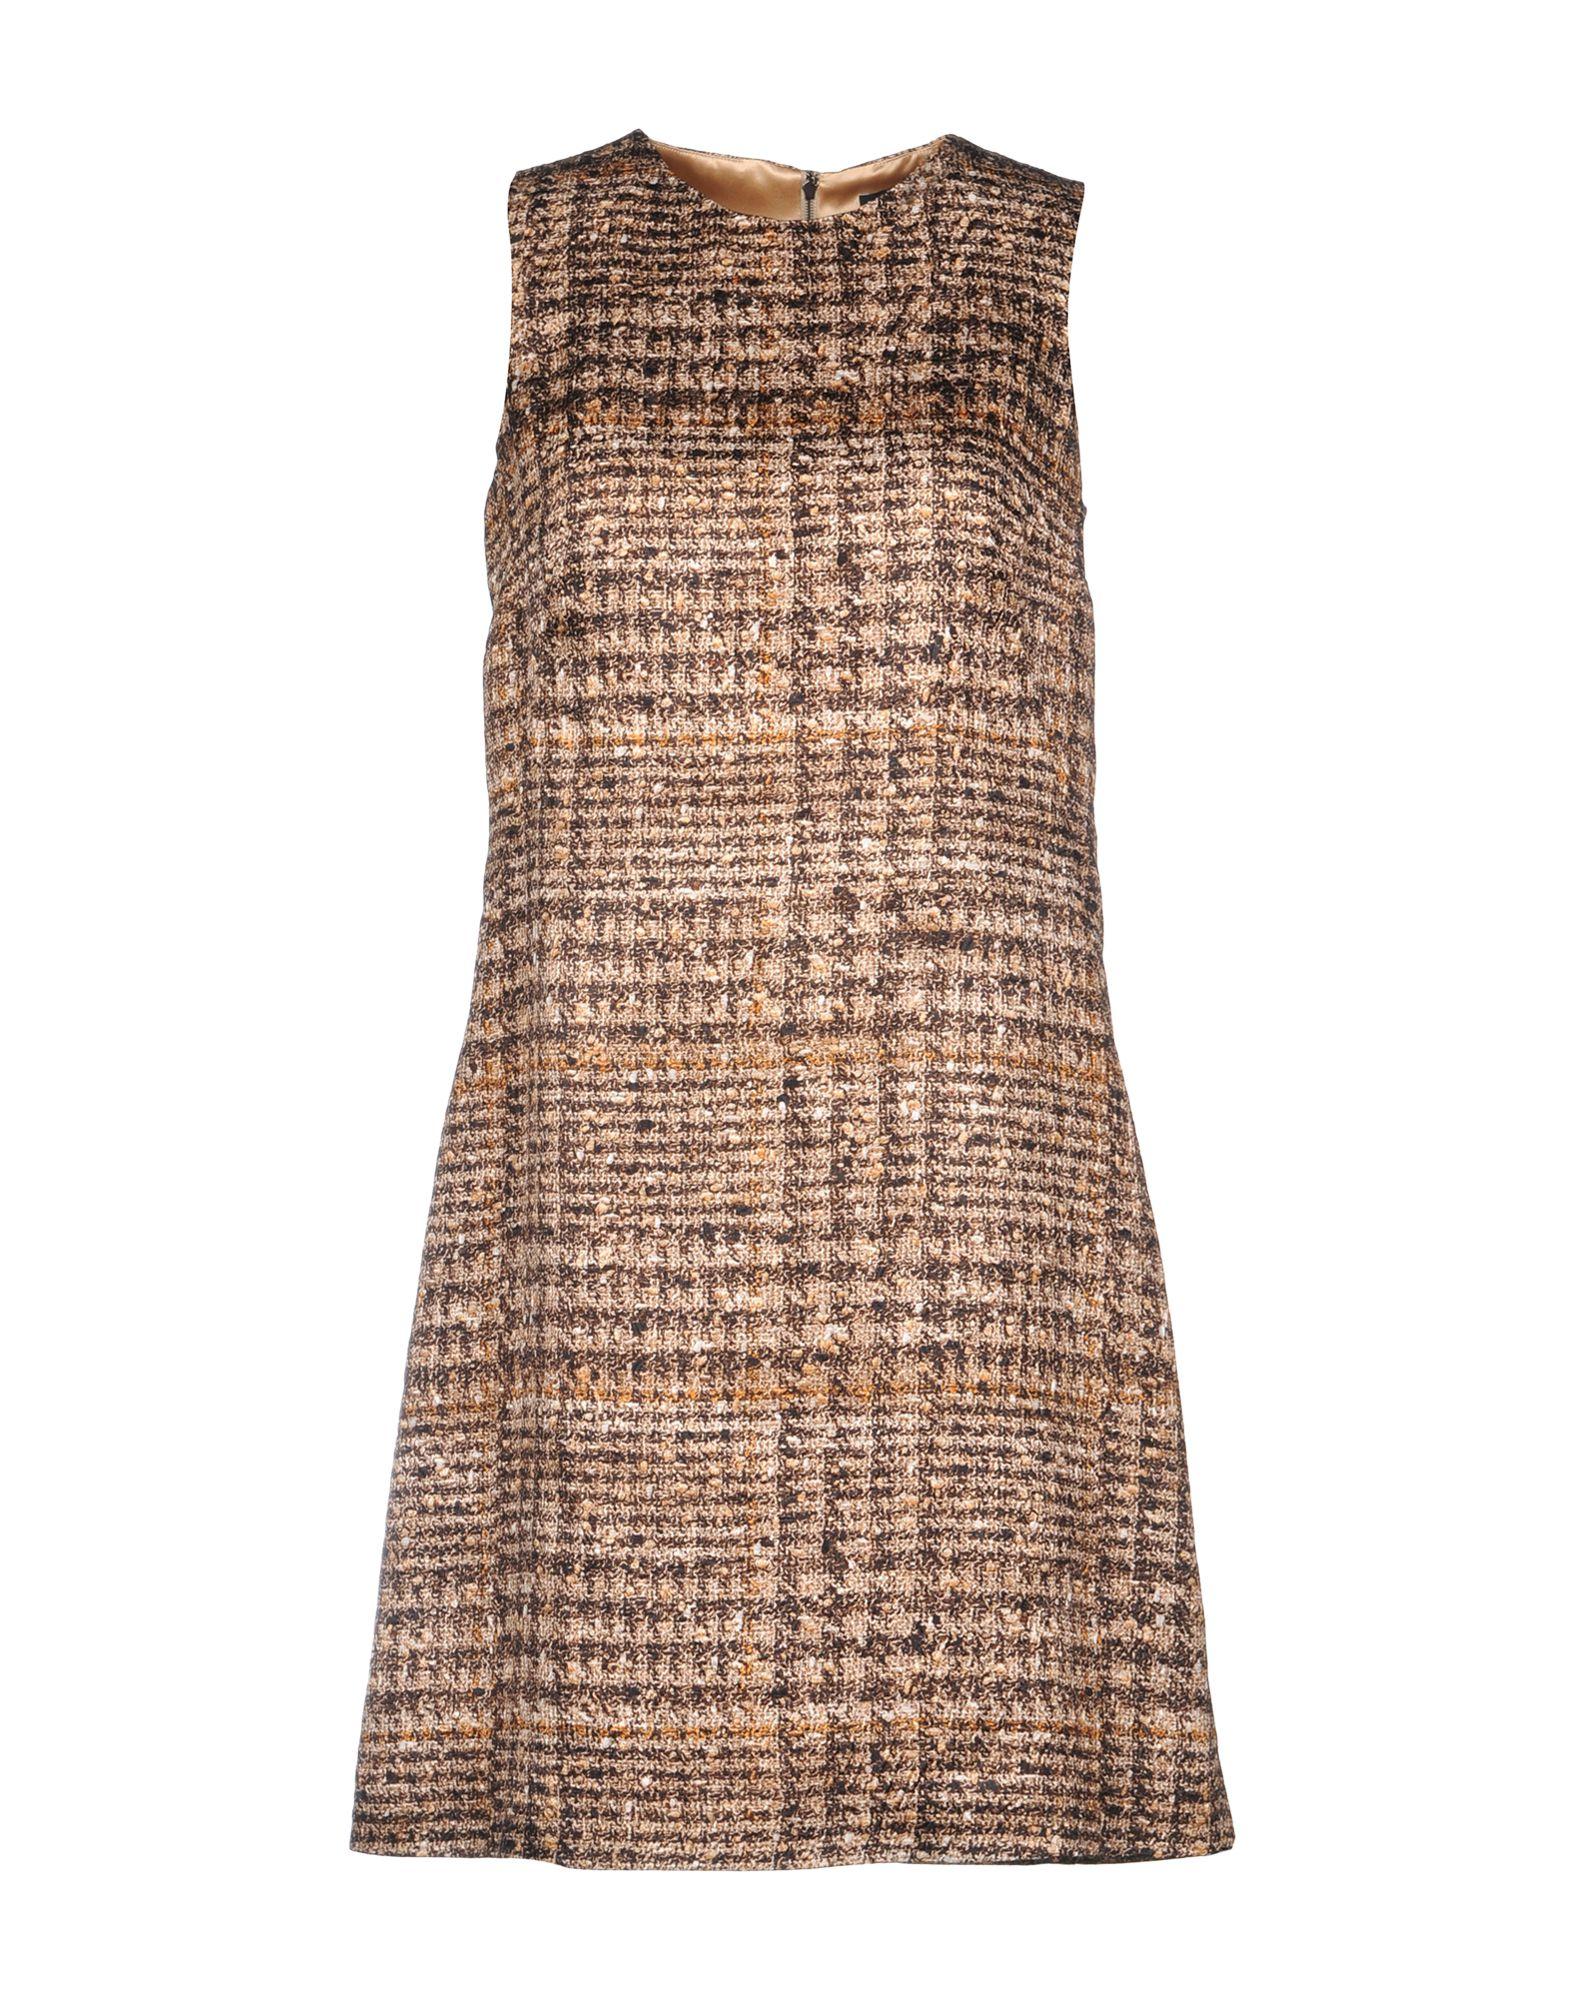 fef9d1138a3e Dolce   Gabbana - Γυναικεία Κοντά Φορέματα